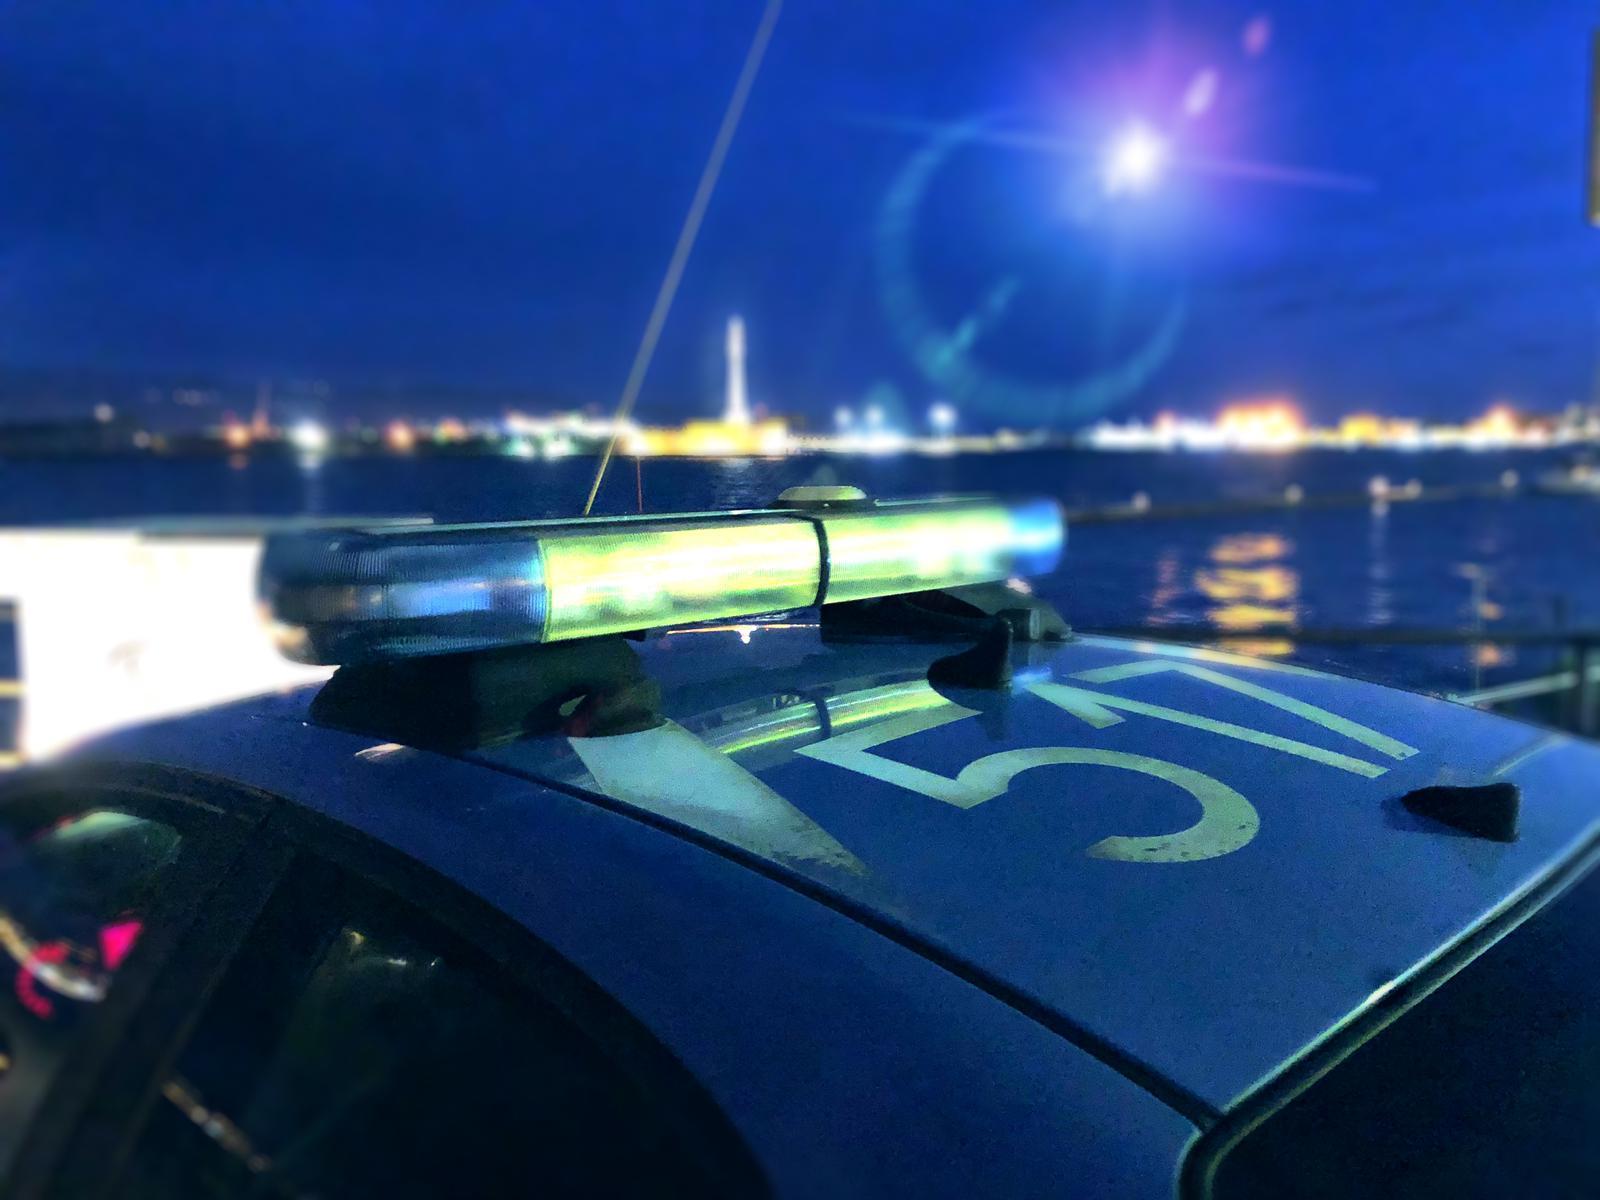 Capo d'Orlando, denunciato 42enne per spaccio